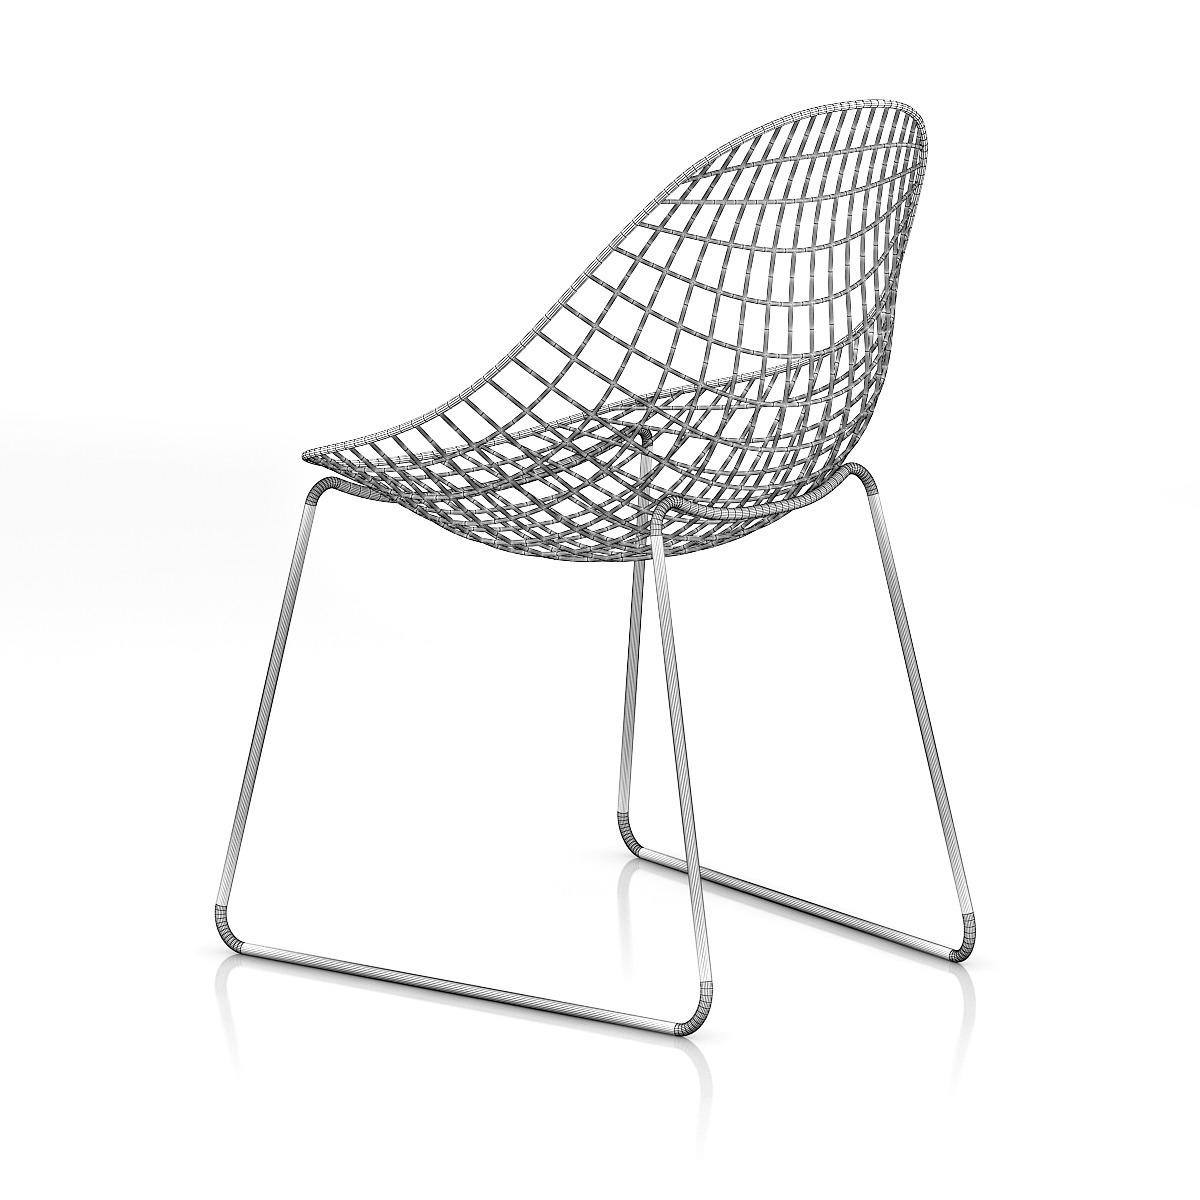 Charmant Metal Mesh Chair